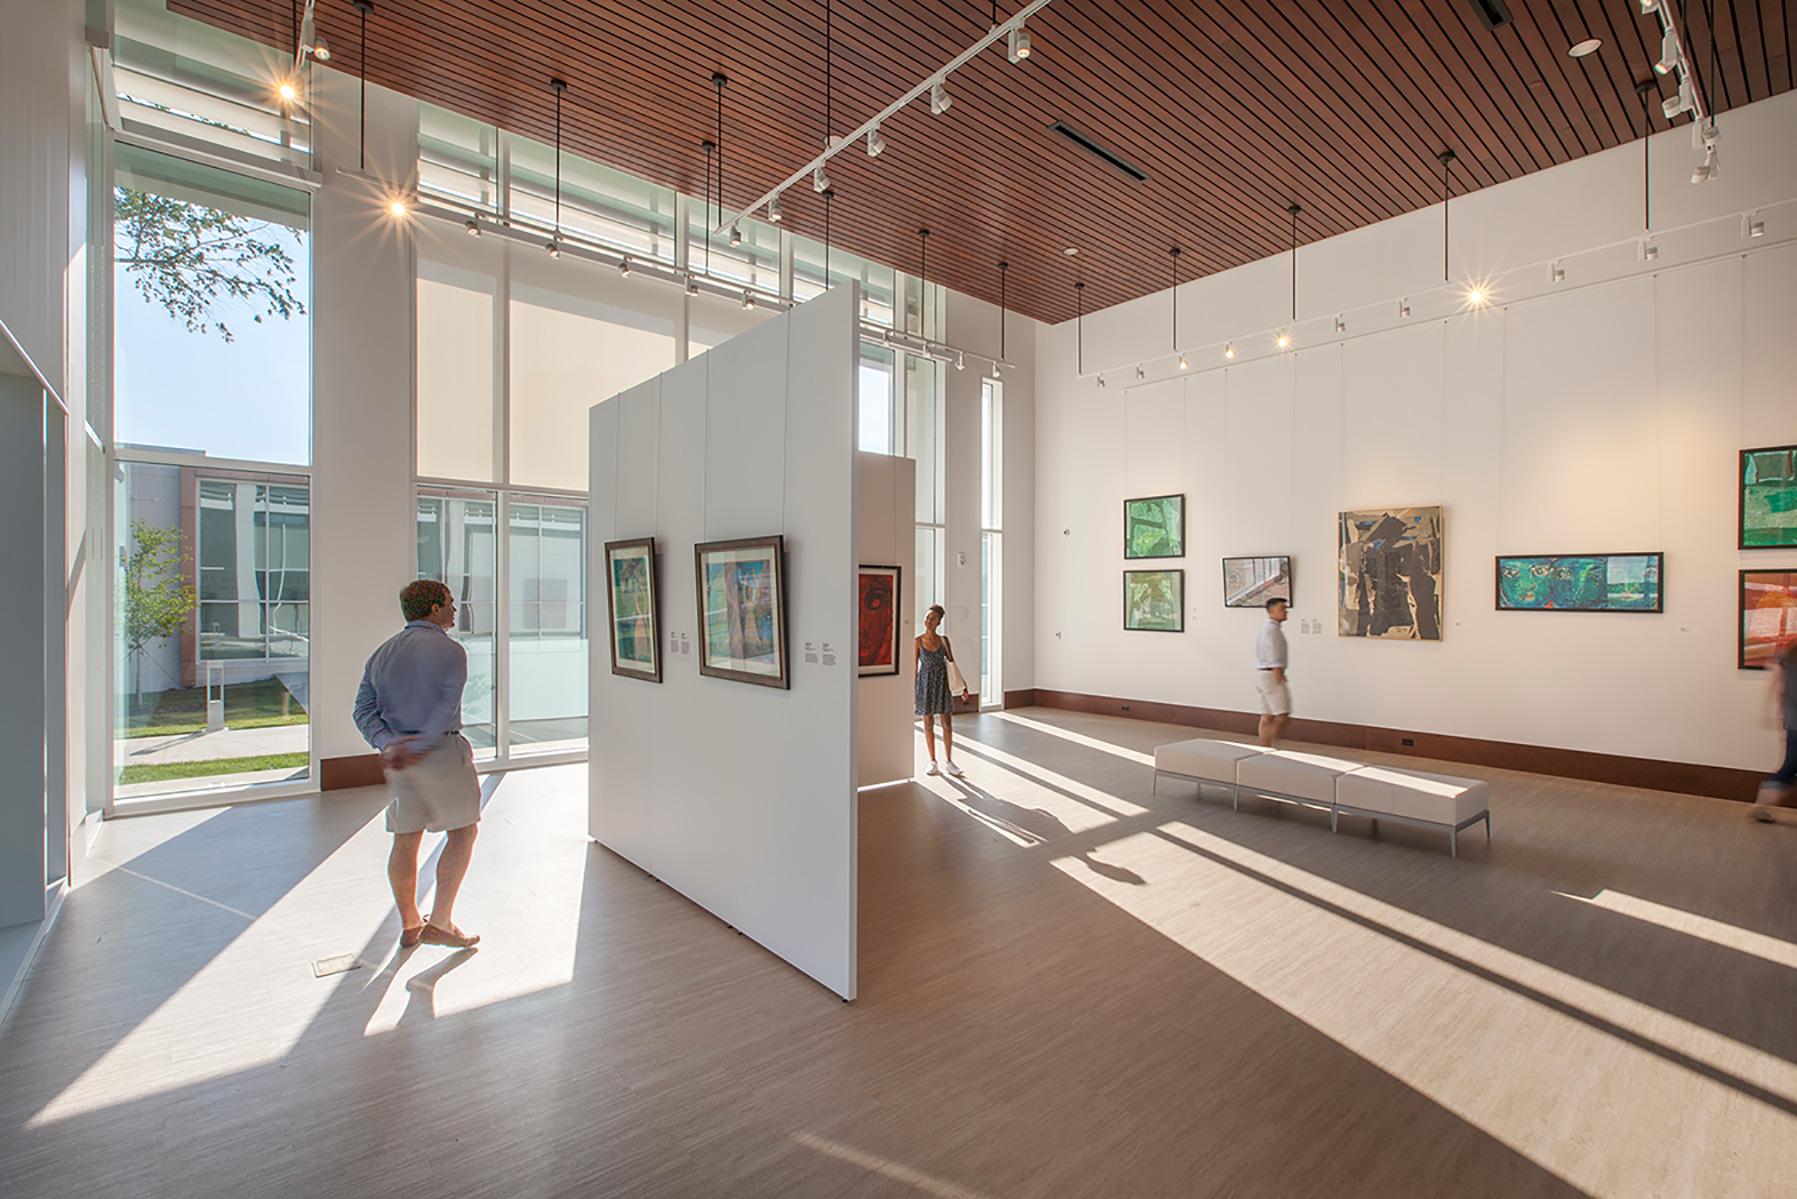 Rosalind Sallenger Richardson Center for the Arts upper gallery